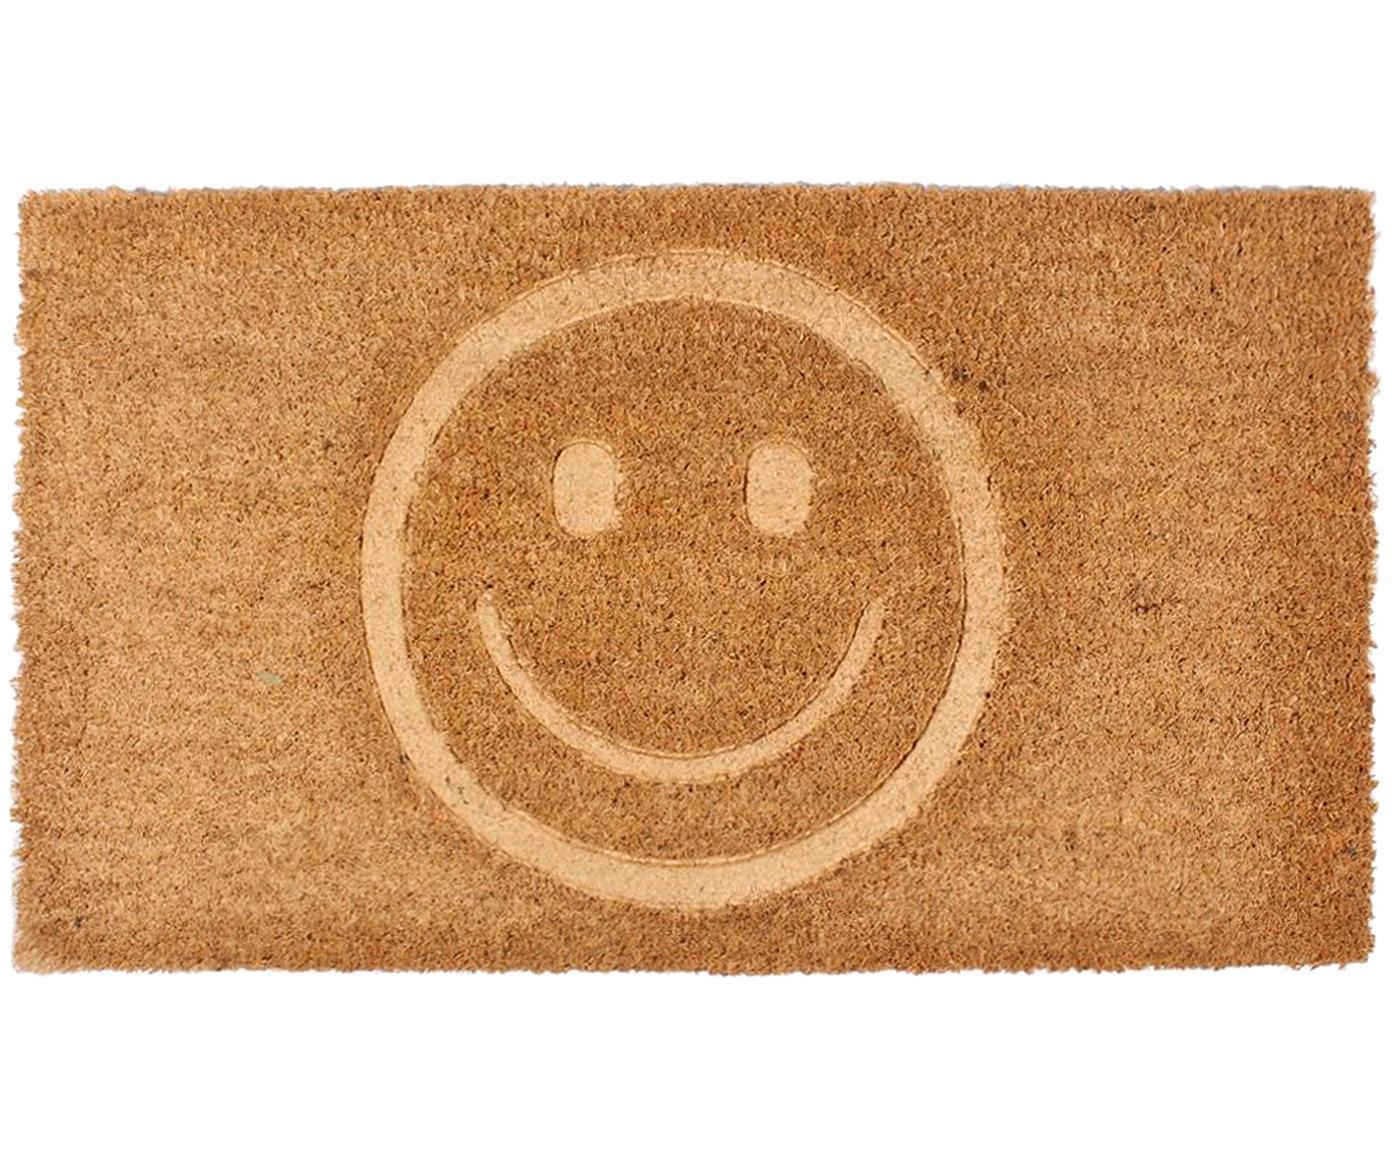 Felpudo Smile, Parte superior: fibras de coco, Reverso: PVC, Marrón, An 40 x L 70 cm